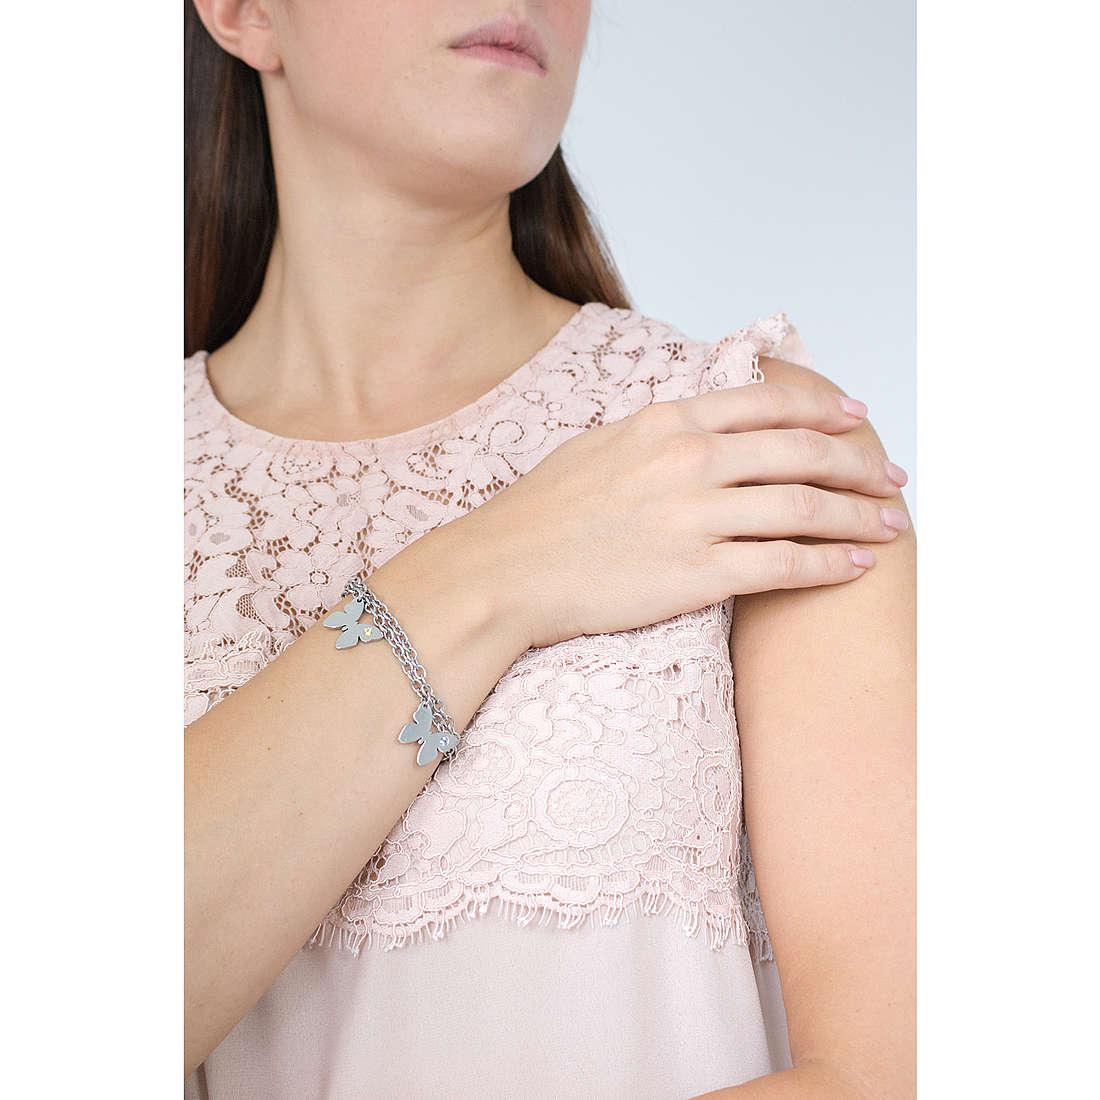 Nomination bracelets Butterfly femme 021316/016 photo wearing